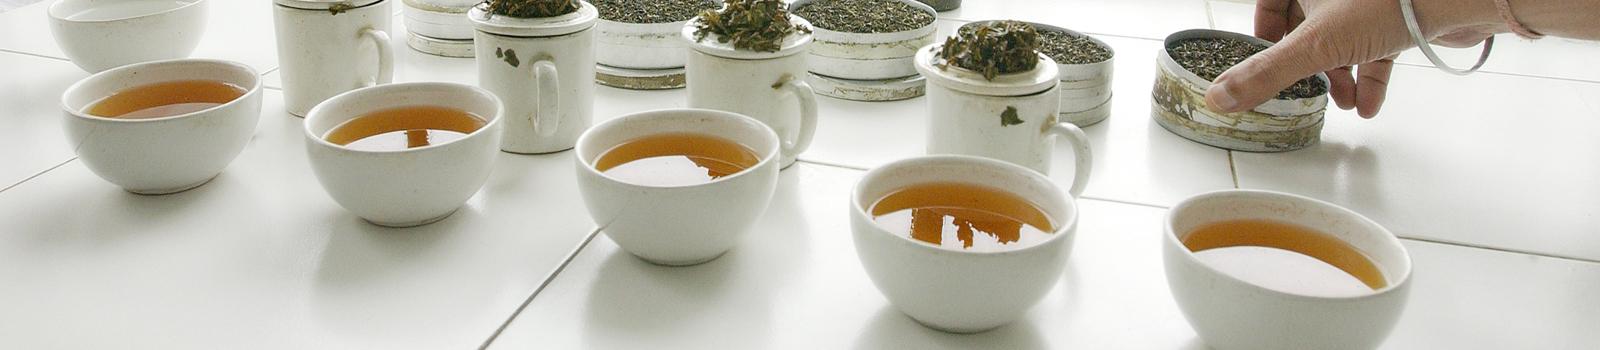 Eilles Tea